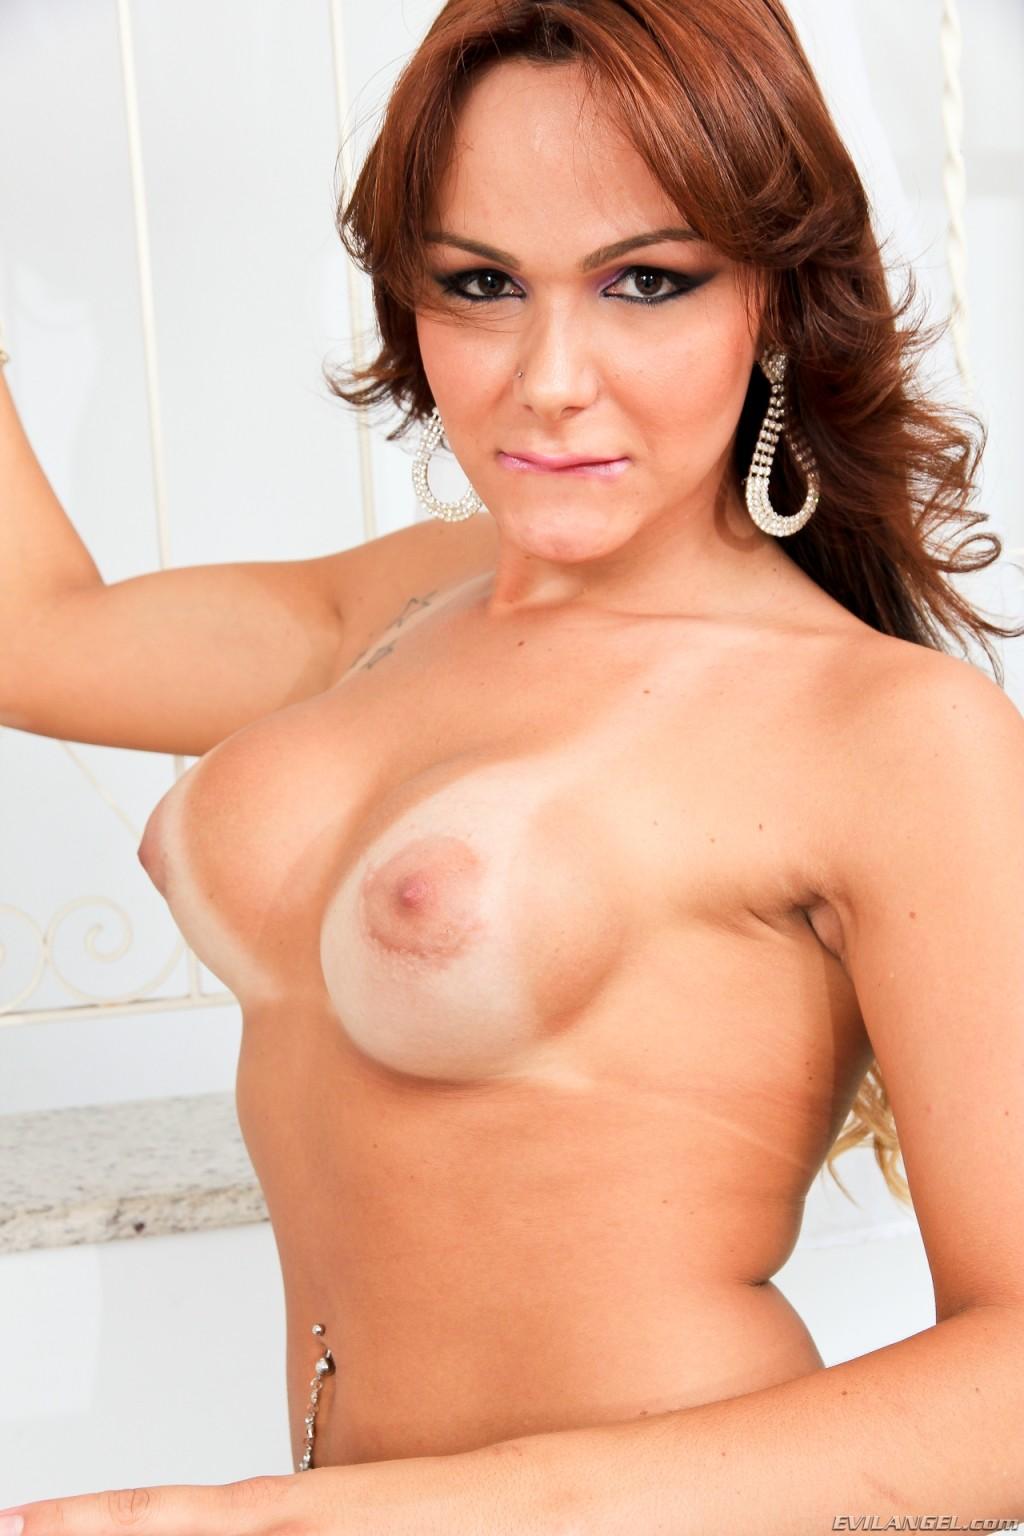 Jessica hilton shemale